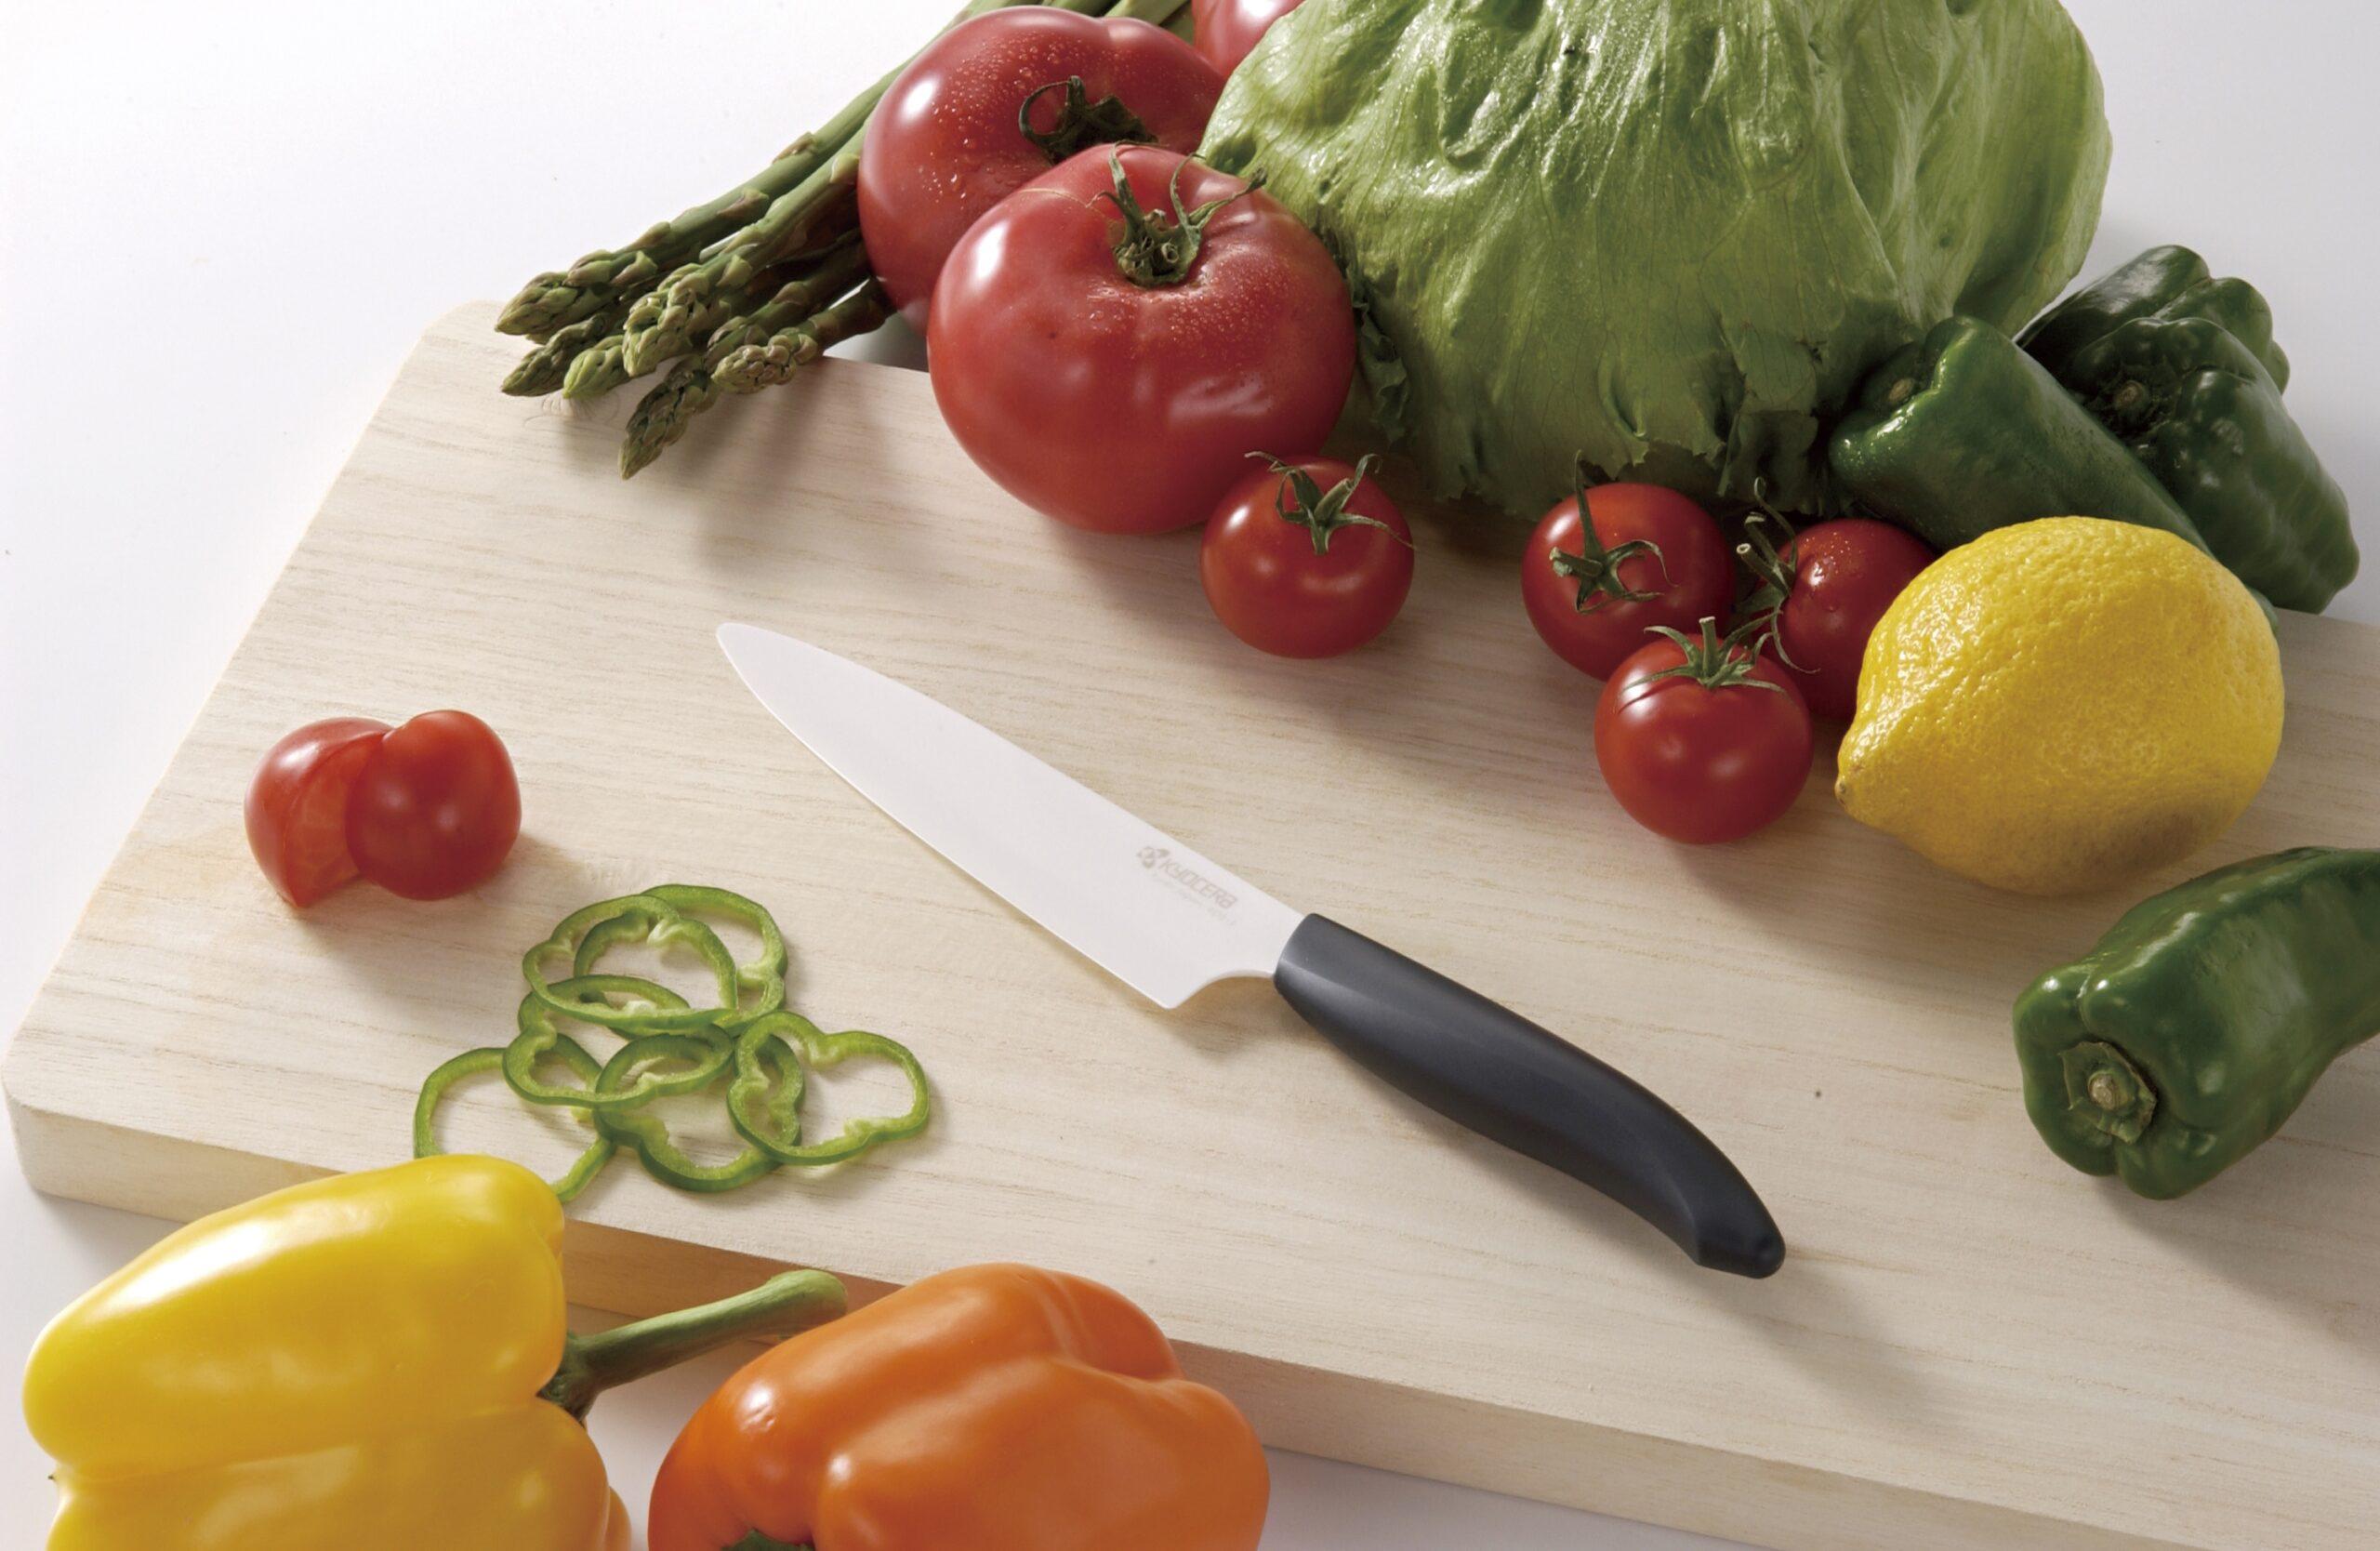 Kyocera Gen Series Tomato Knife Serrated 12.5cm